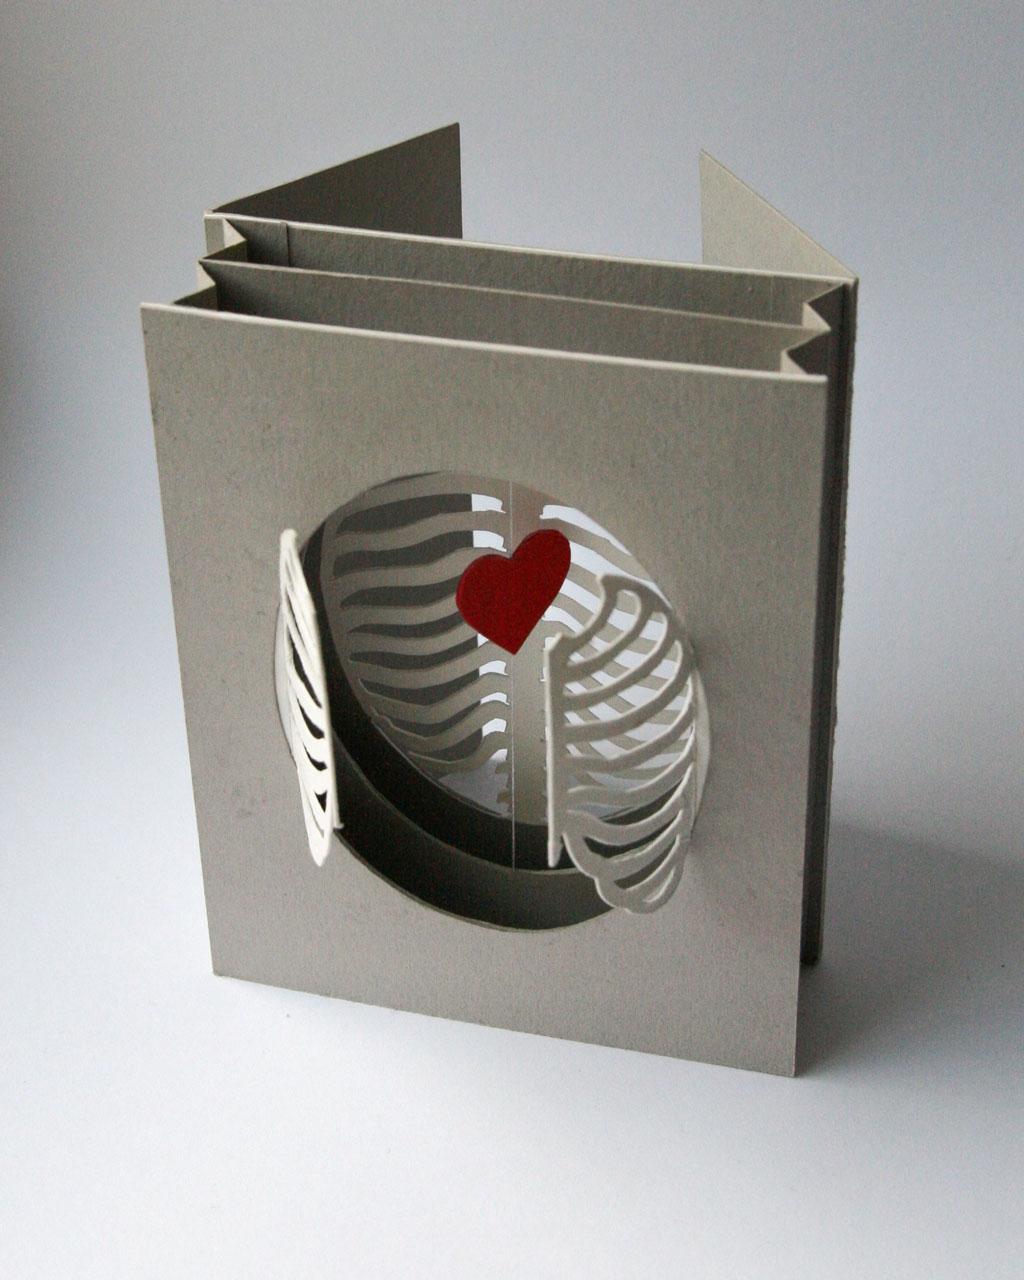 'Cardiothoracic' tunnel book/card